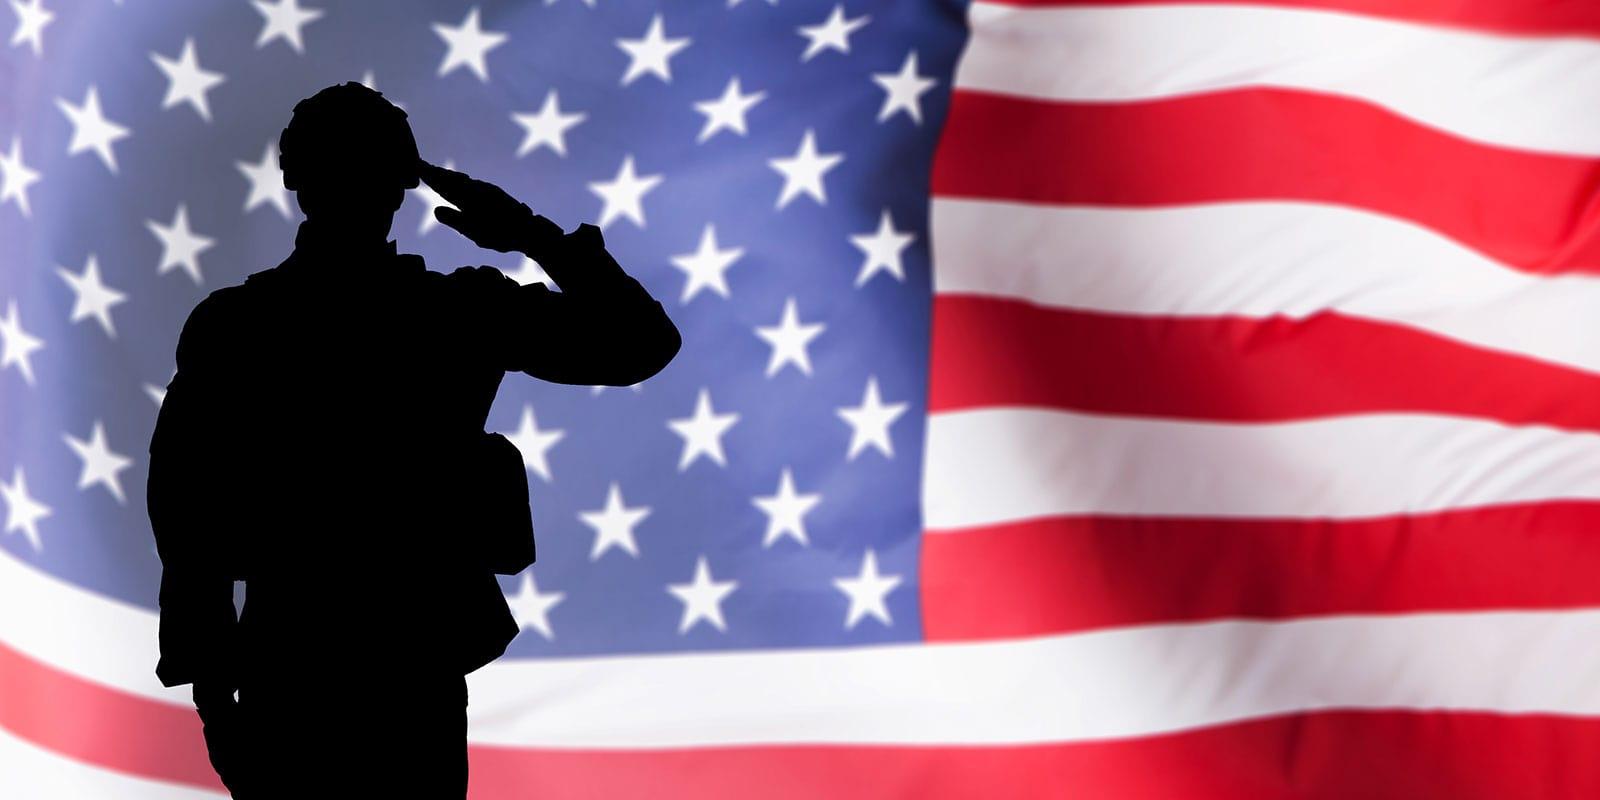 American Flag Salute